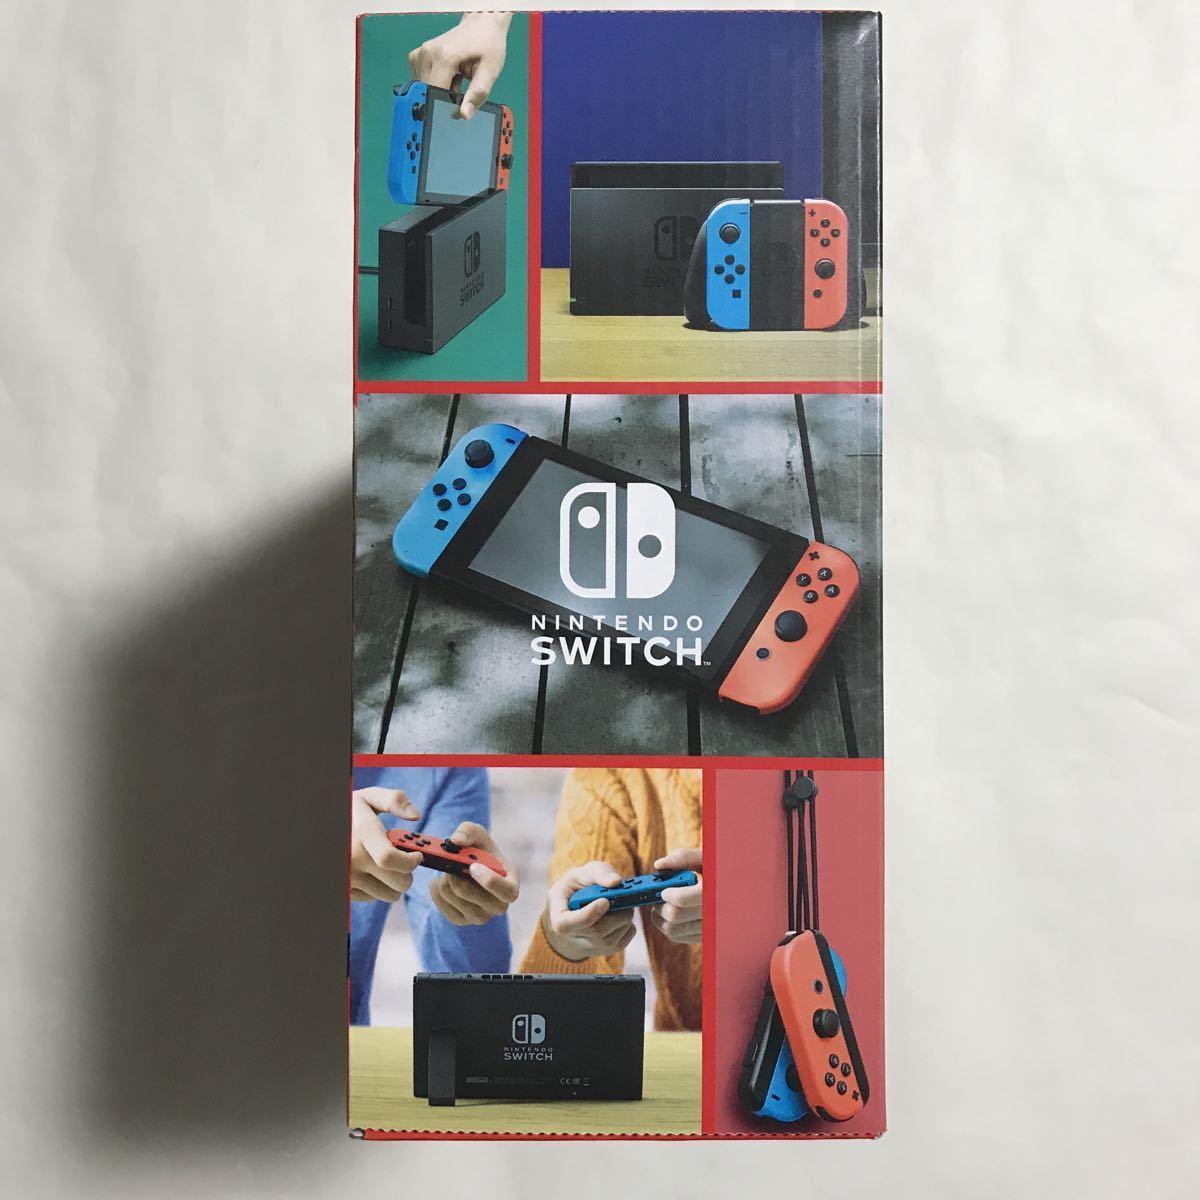 Nintendo Switch本体Joy-Con(L)ネオンブルー/(R)ネオンレッド新型 おまけ付 [新品未開封] 送料無料 ニンテンドースイッチ本体 任天堂 _画像6